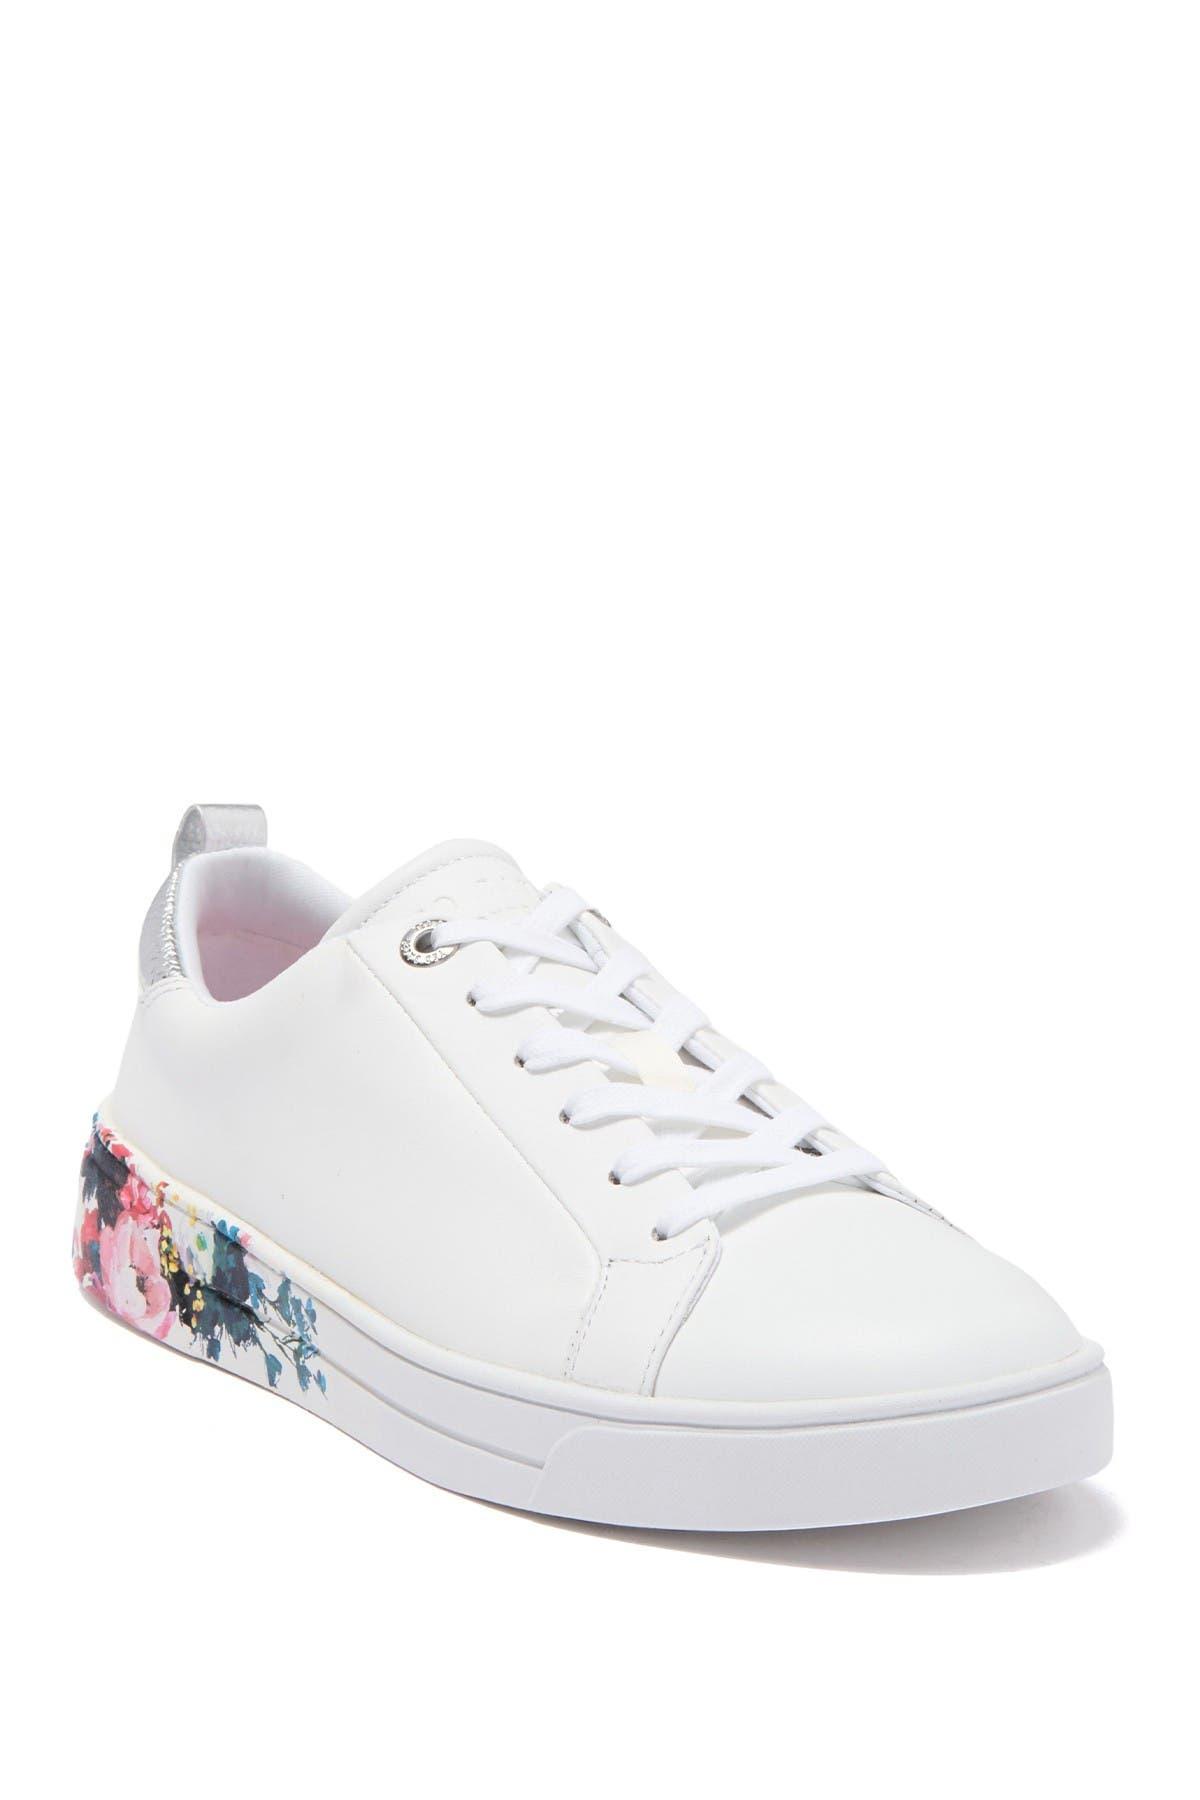 Ted Baker London   Roully Sneaker